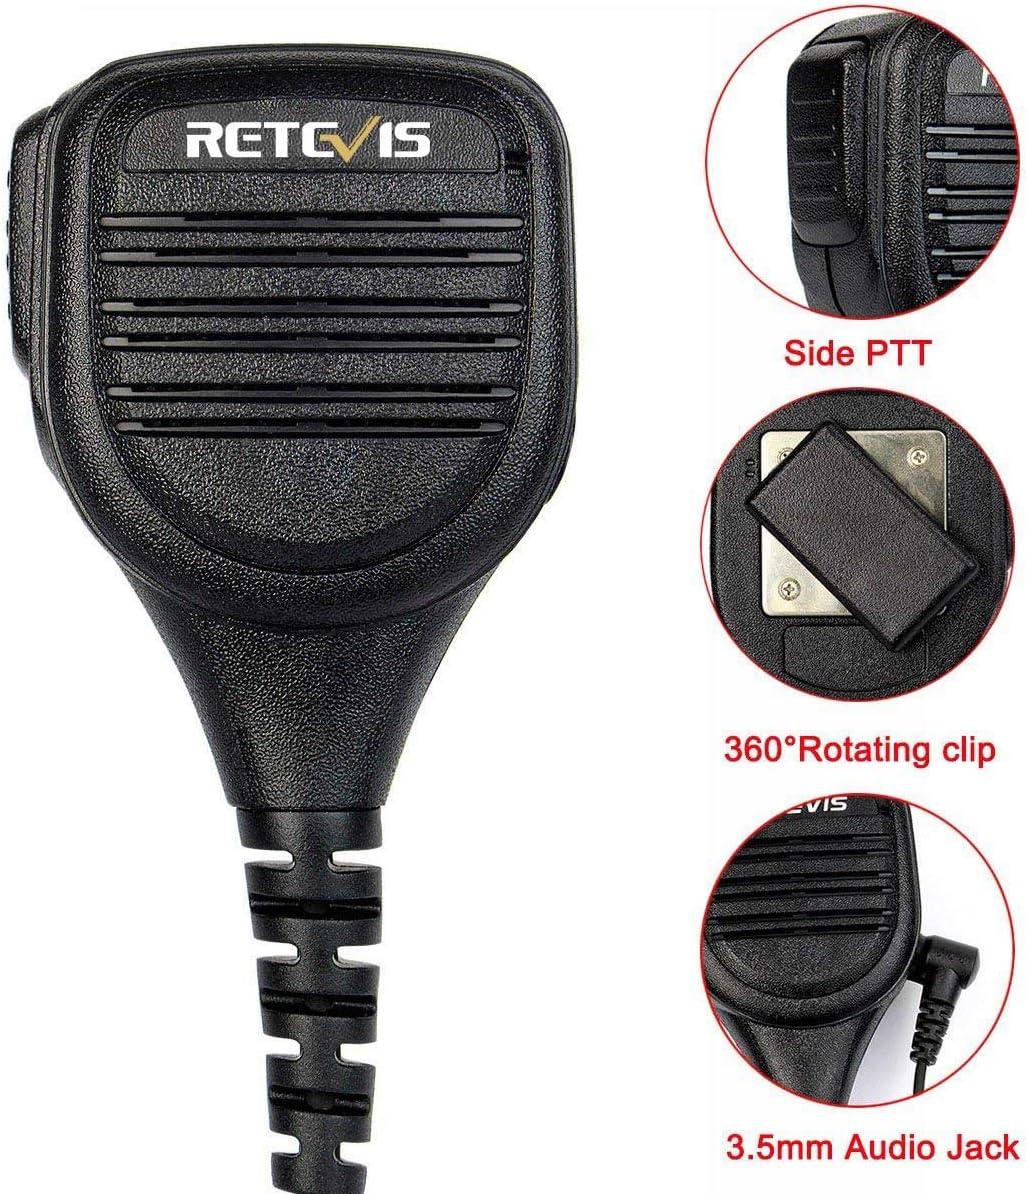 Retevis Walkie Talkies Mic 2 Pin 3.5mm Audio Jack Shoulder Speaker Microphone for Baofeng BF-888S UV-5R Retevis RT22 RT21 RT-5R 2 Way Radios 1 Pack